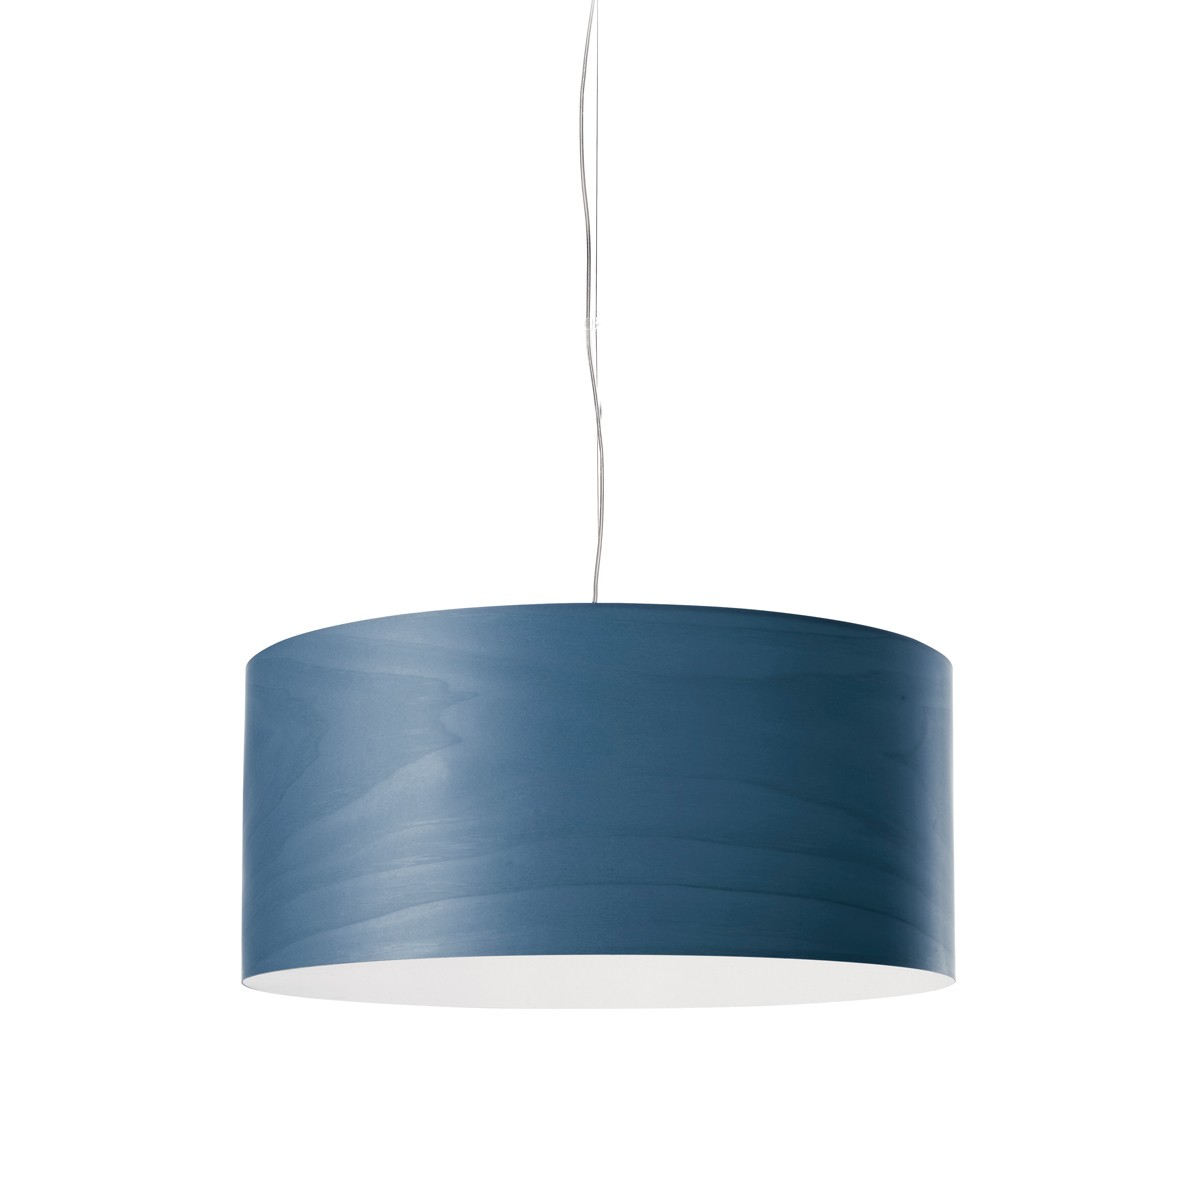 LZF Lamps Gea Small Pendelleuchte, blau